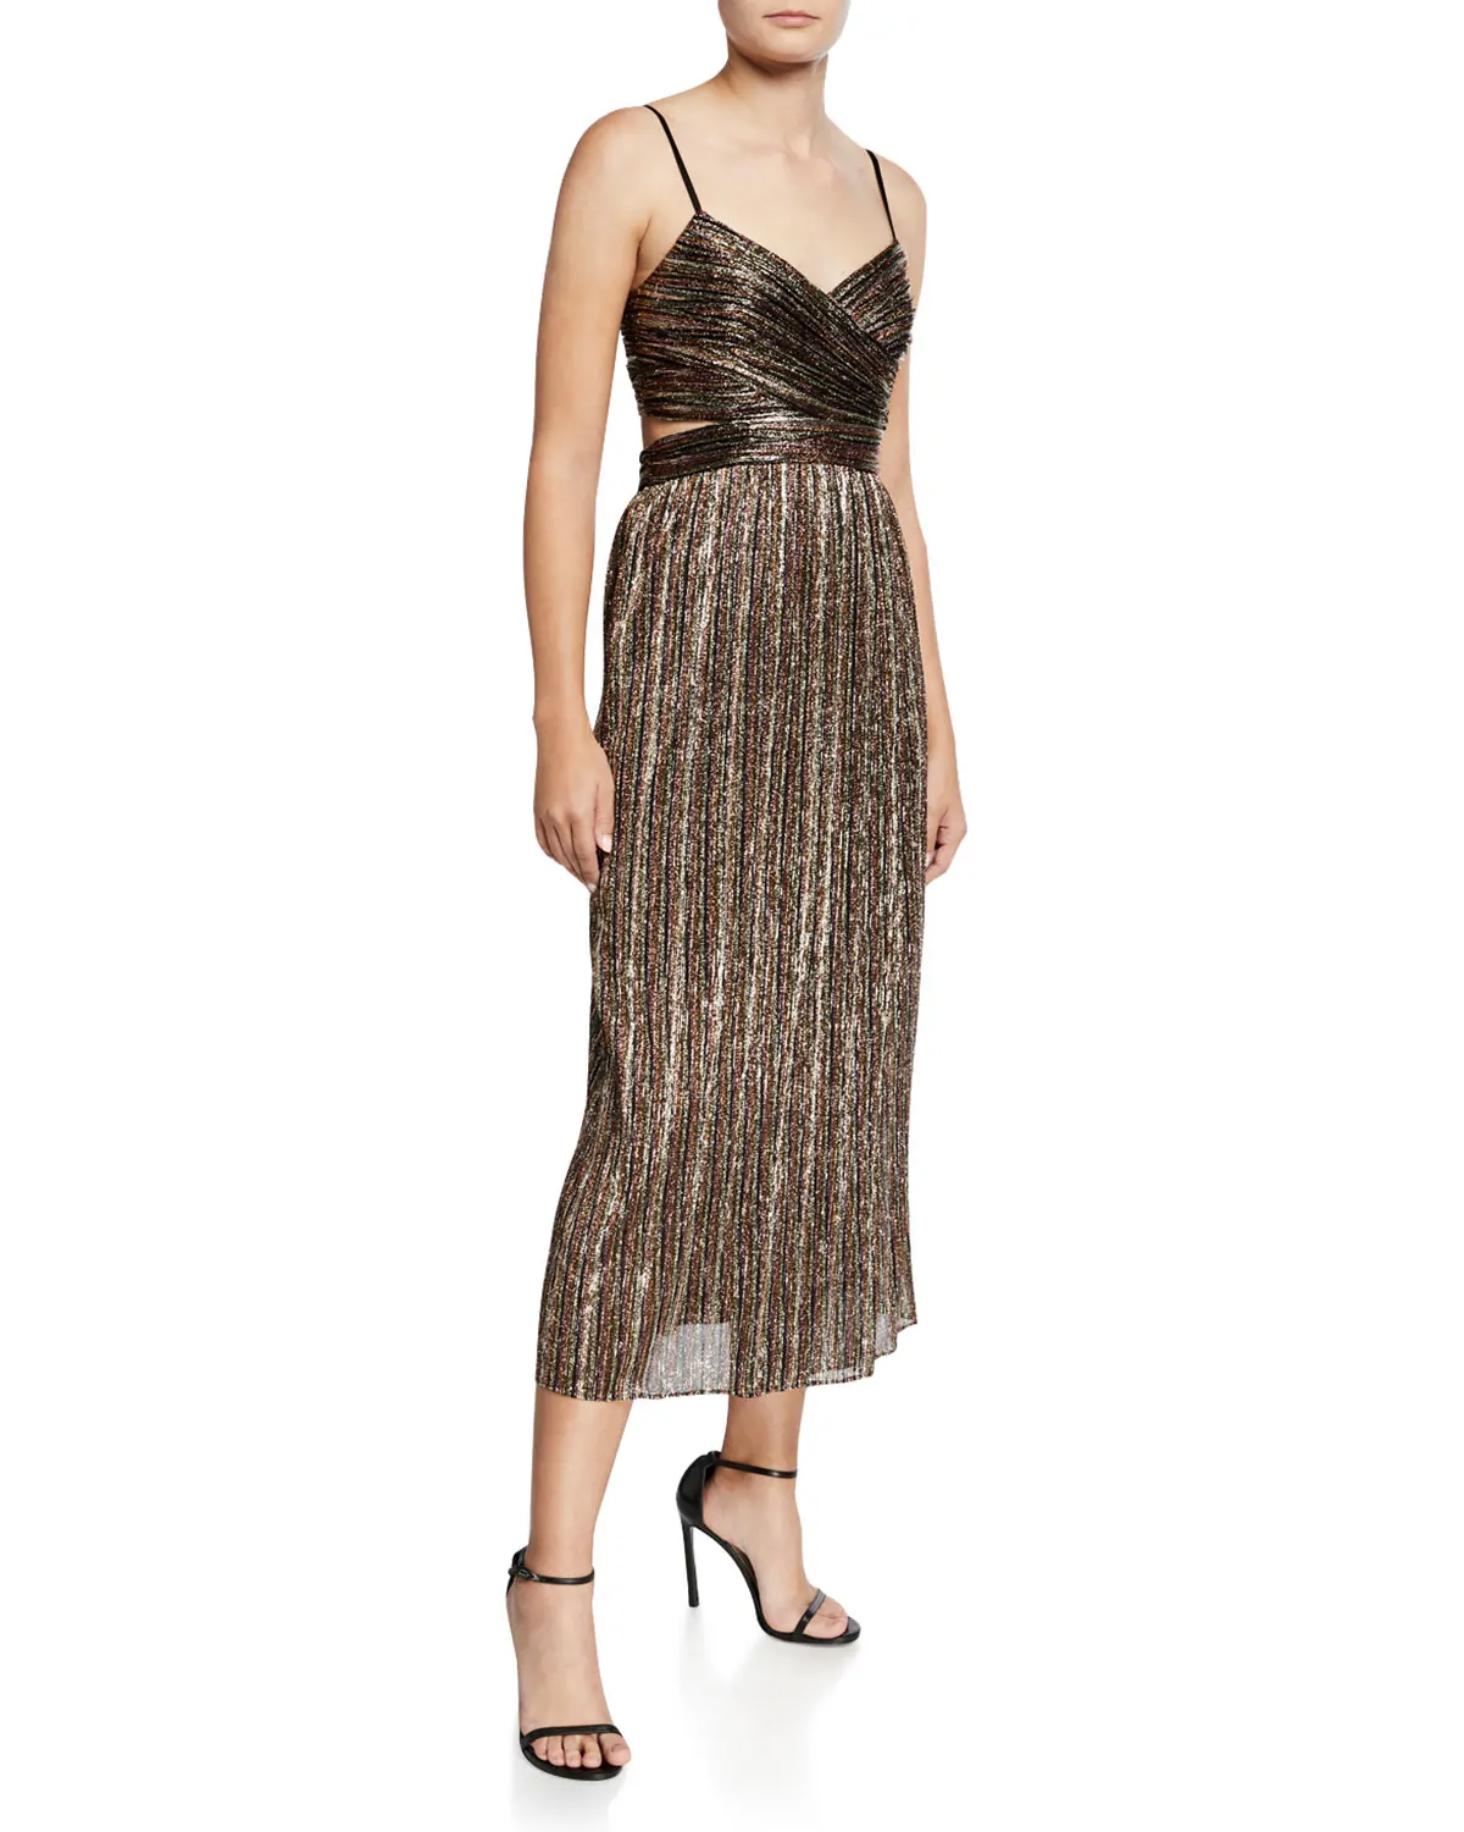 Aidan by Aidan Mattox Pleated Metallic Stripe Sleeveless Midi Cocktail Dress